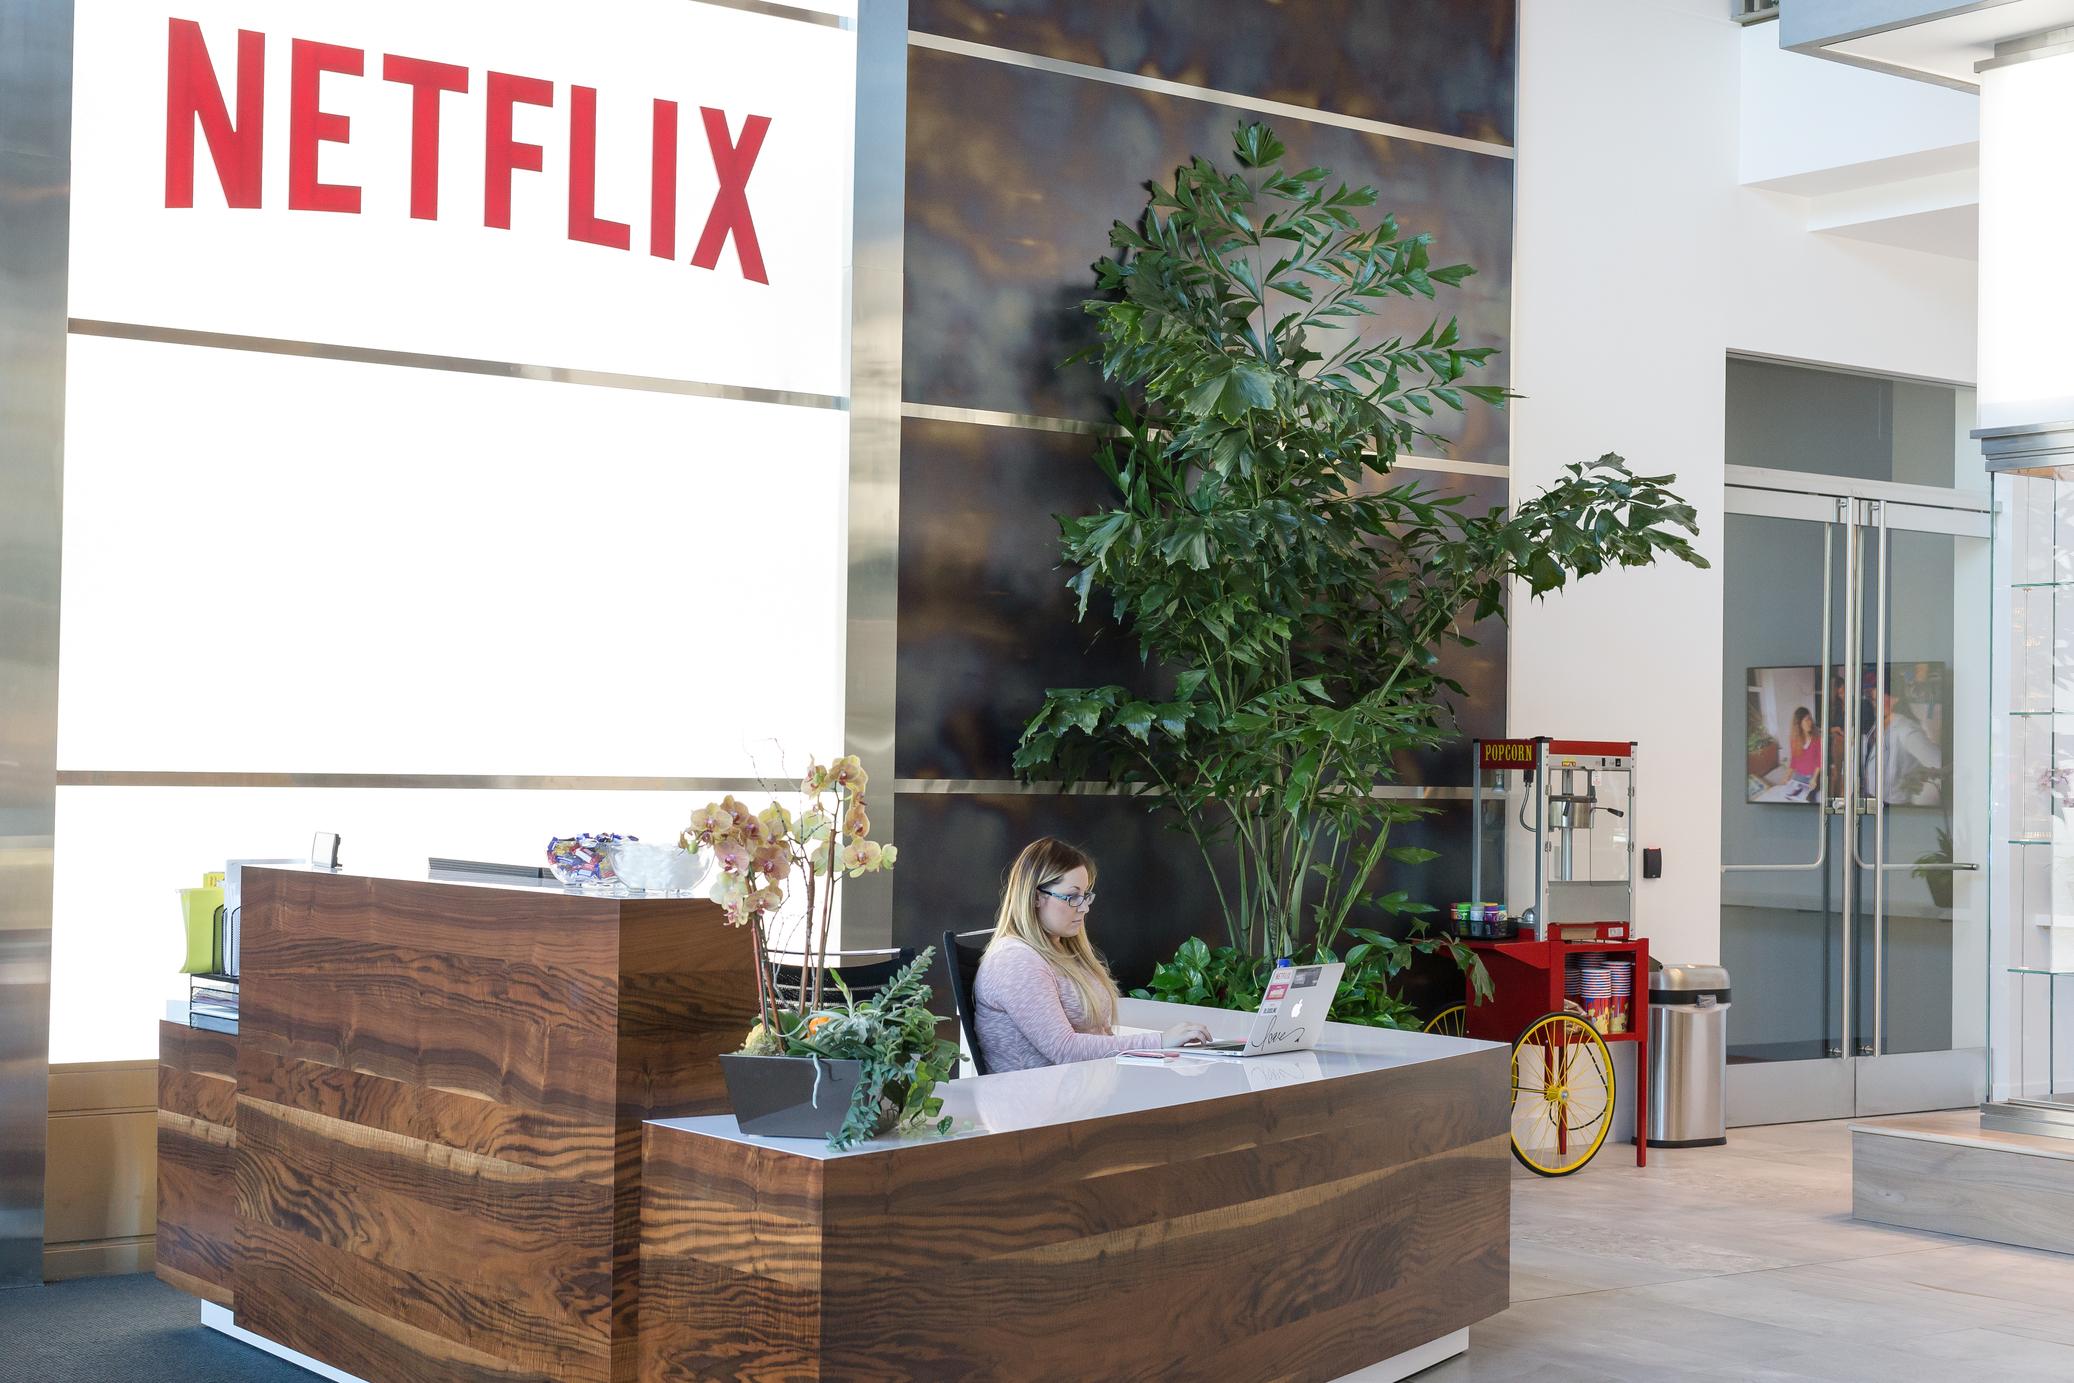 The reception desk in Netflix Los Gatos headquarters with Netflix sign above desk.